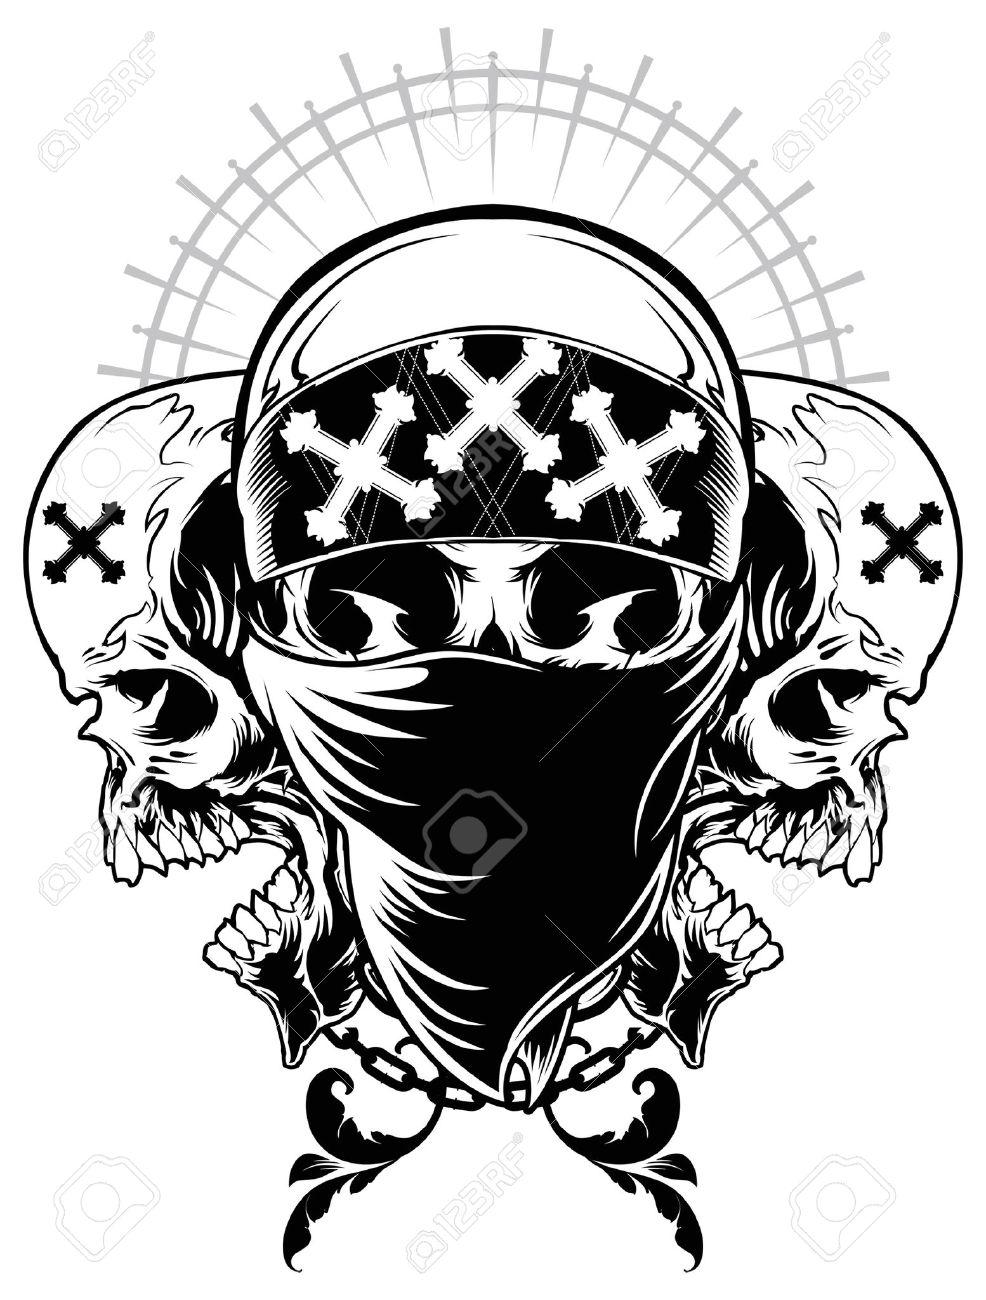 986x1300 Skull Gangster Illustration Royalty Free Cliparts, Vectors,